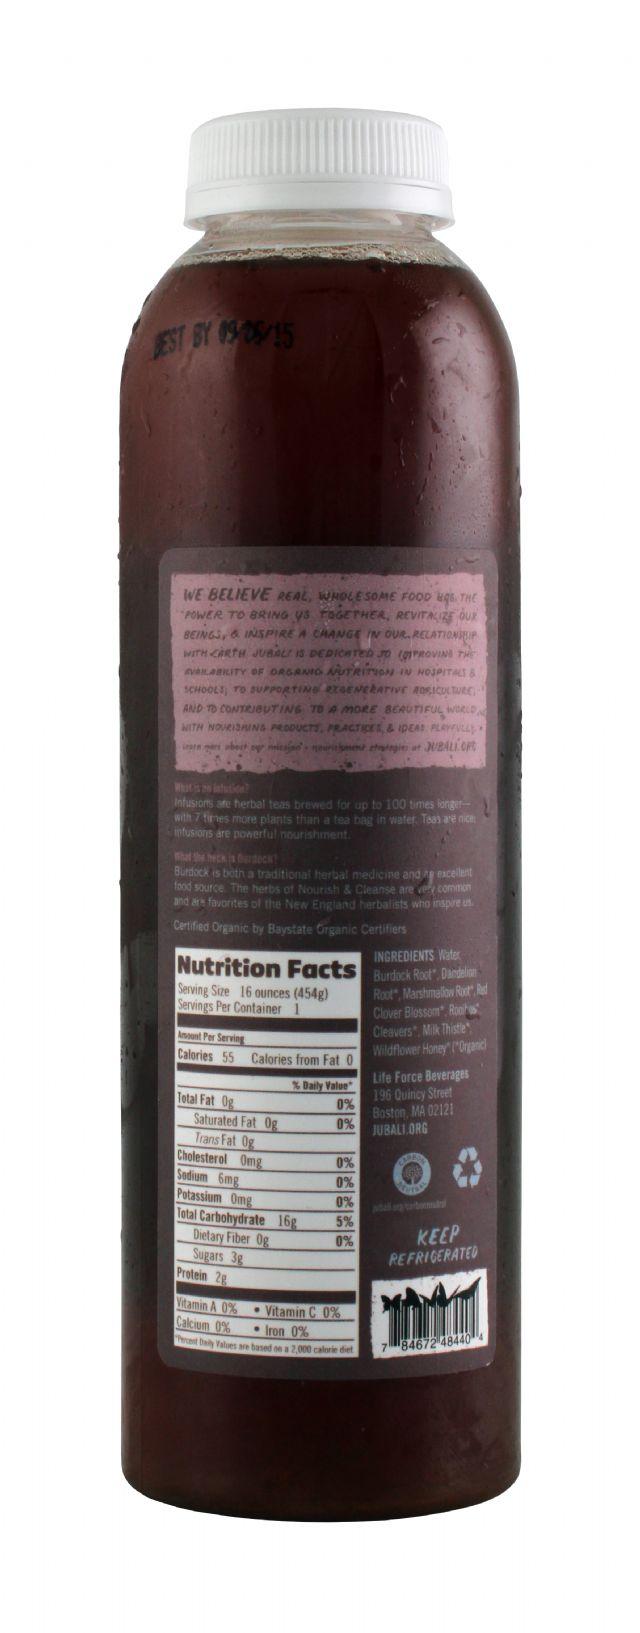 Jubali Herbal Infusions: Jubali NourishCleanse Facts